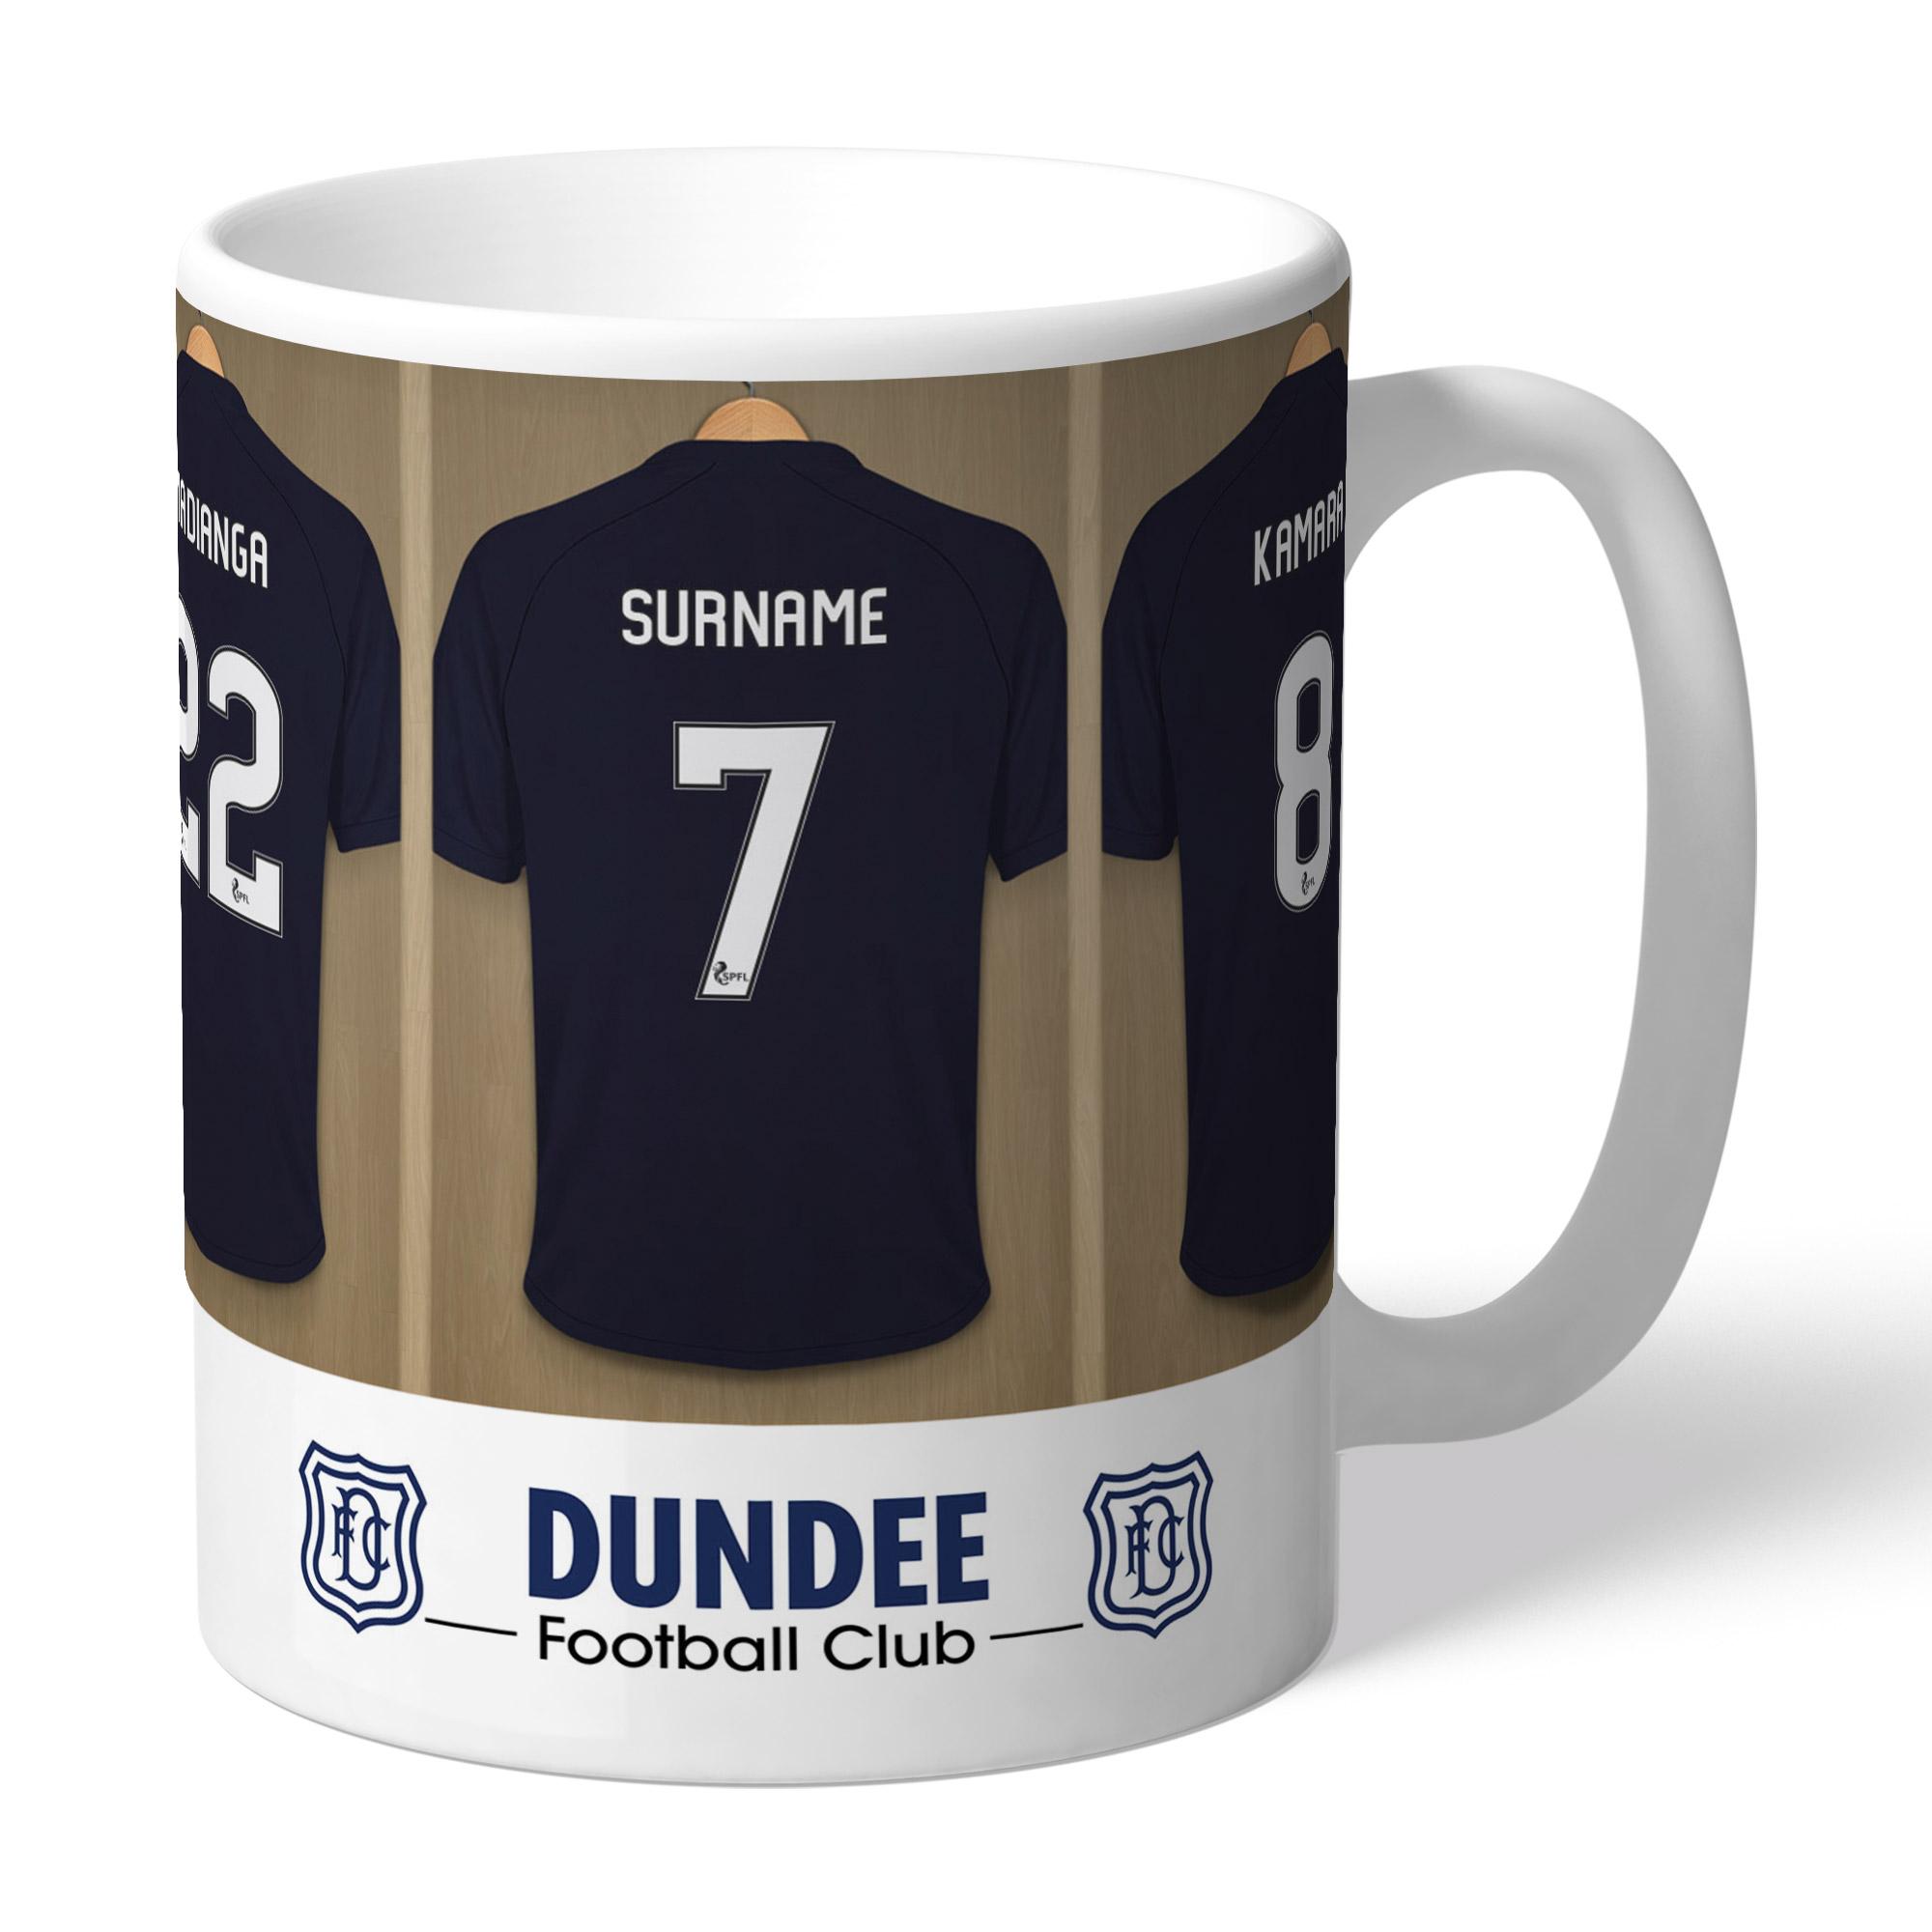 Dundee FC Dressing Room Mug